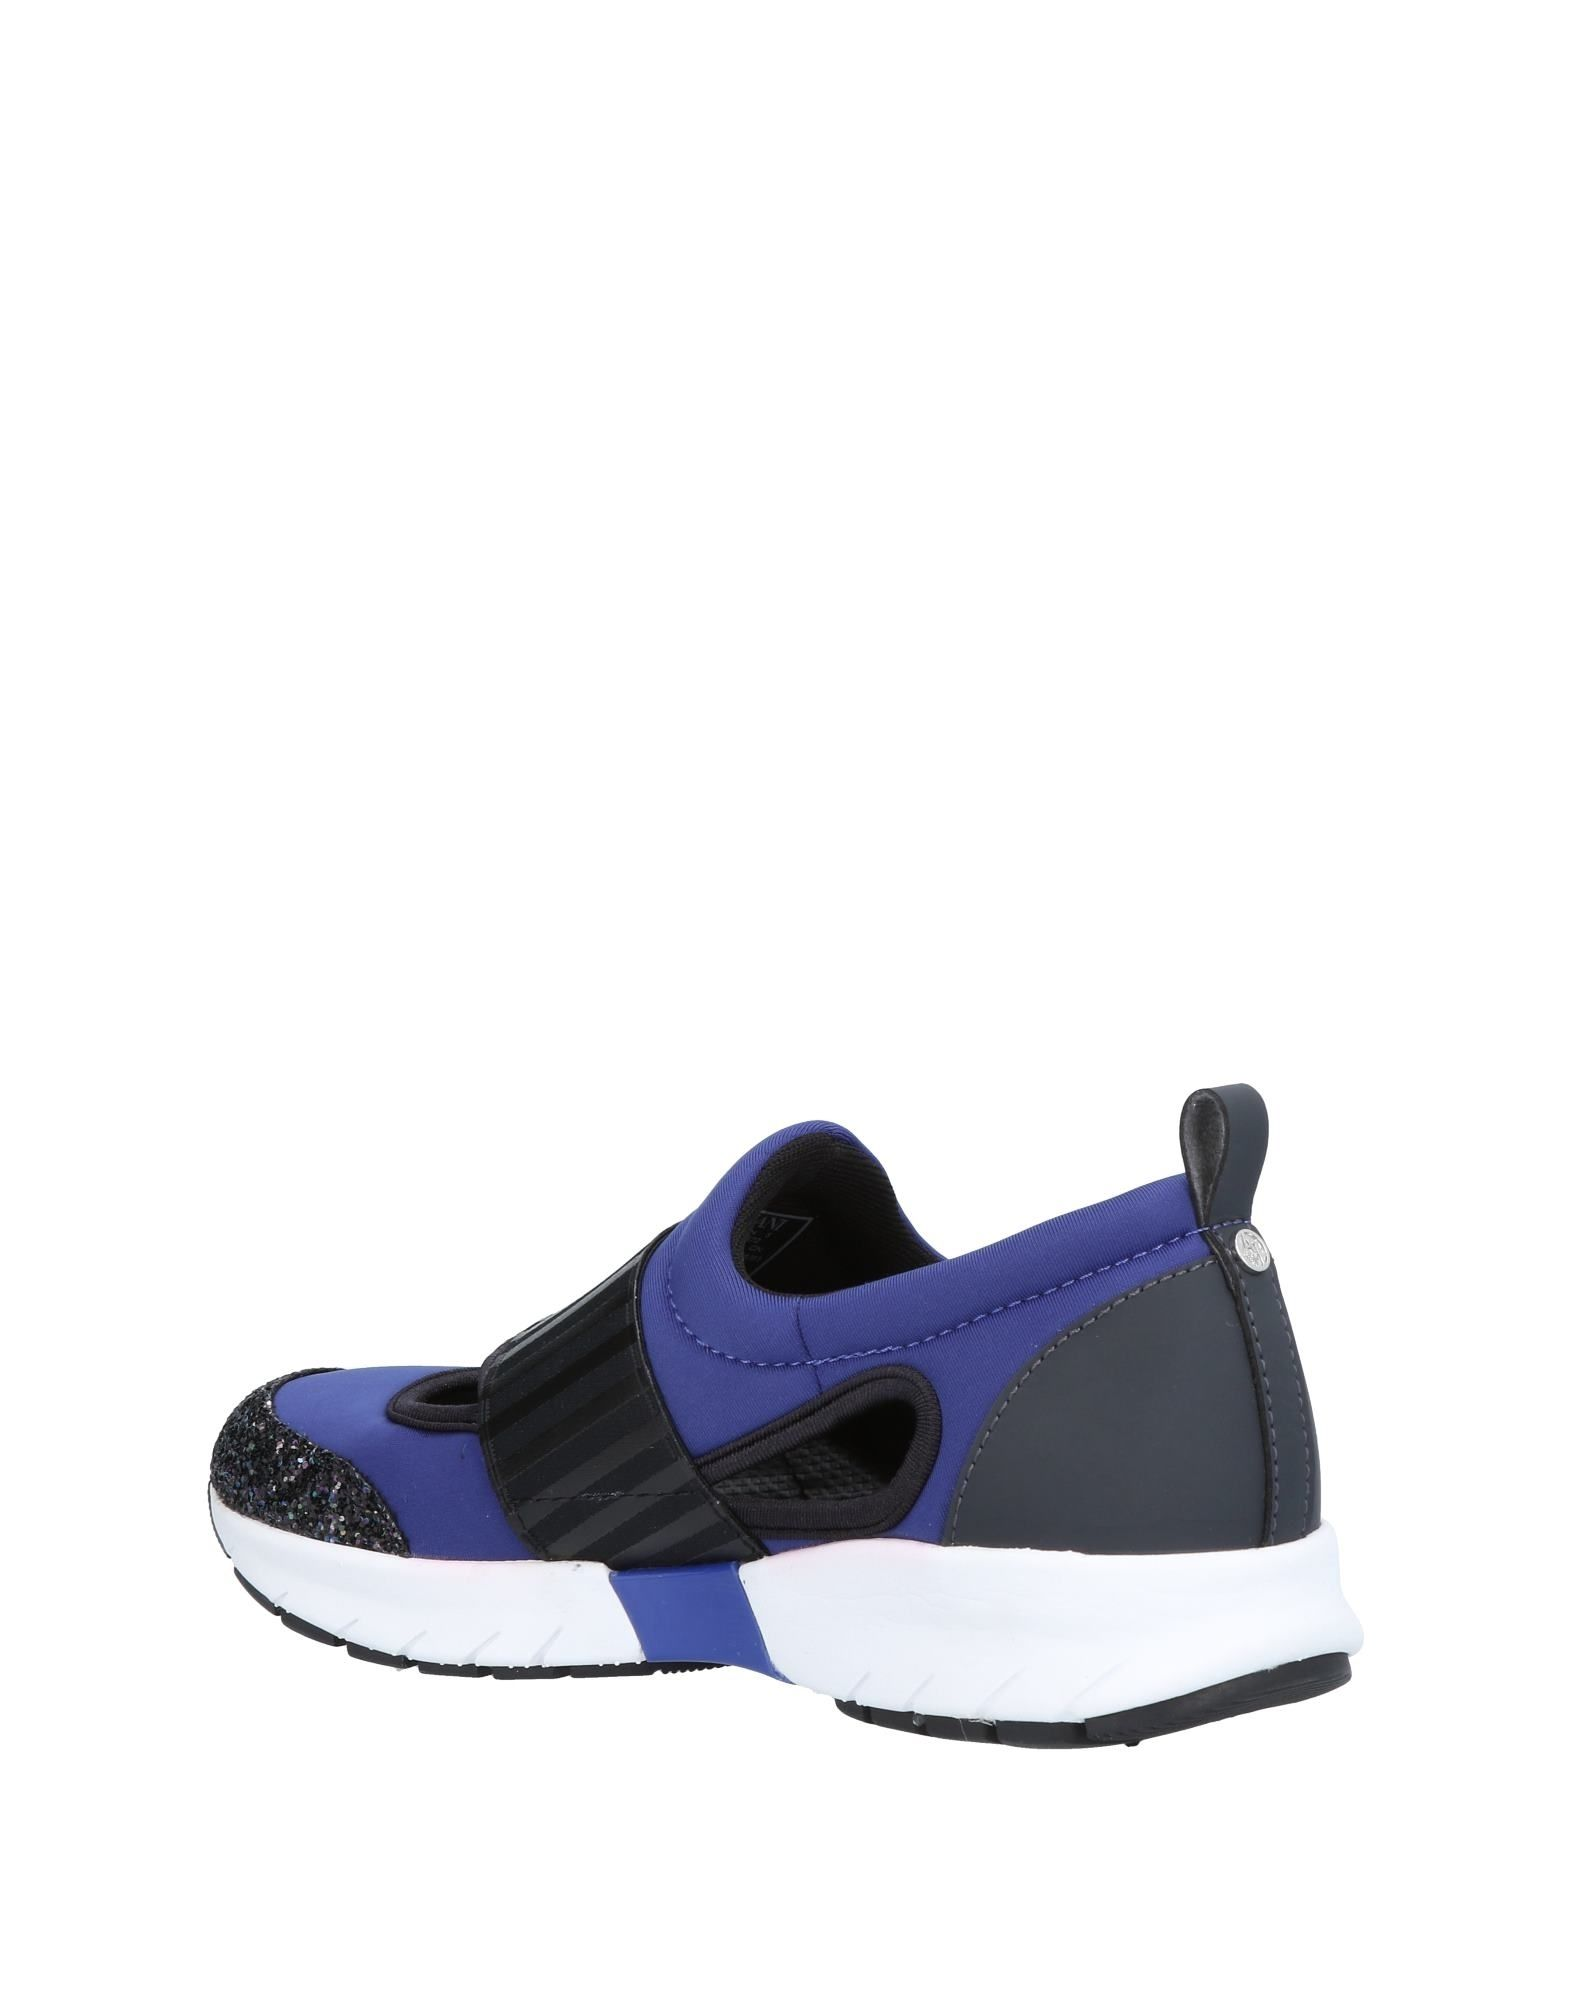 Stilvolle billige Schuhe Armani 11433020UX Jeans Sneakers Damen  11433020UX Armani e6ea50